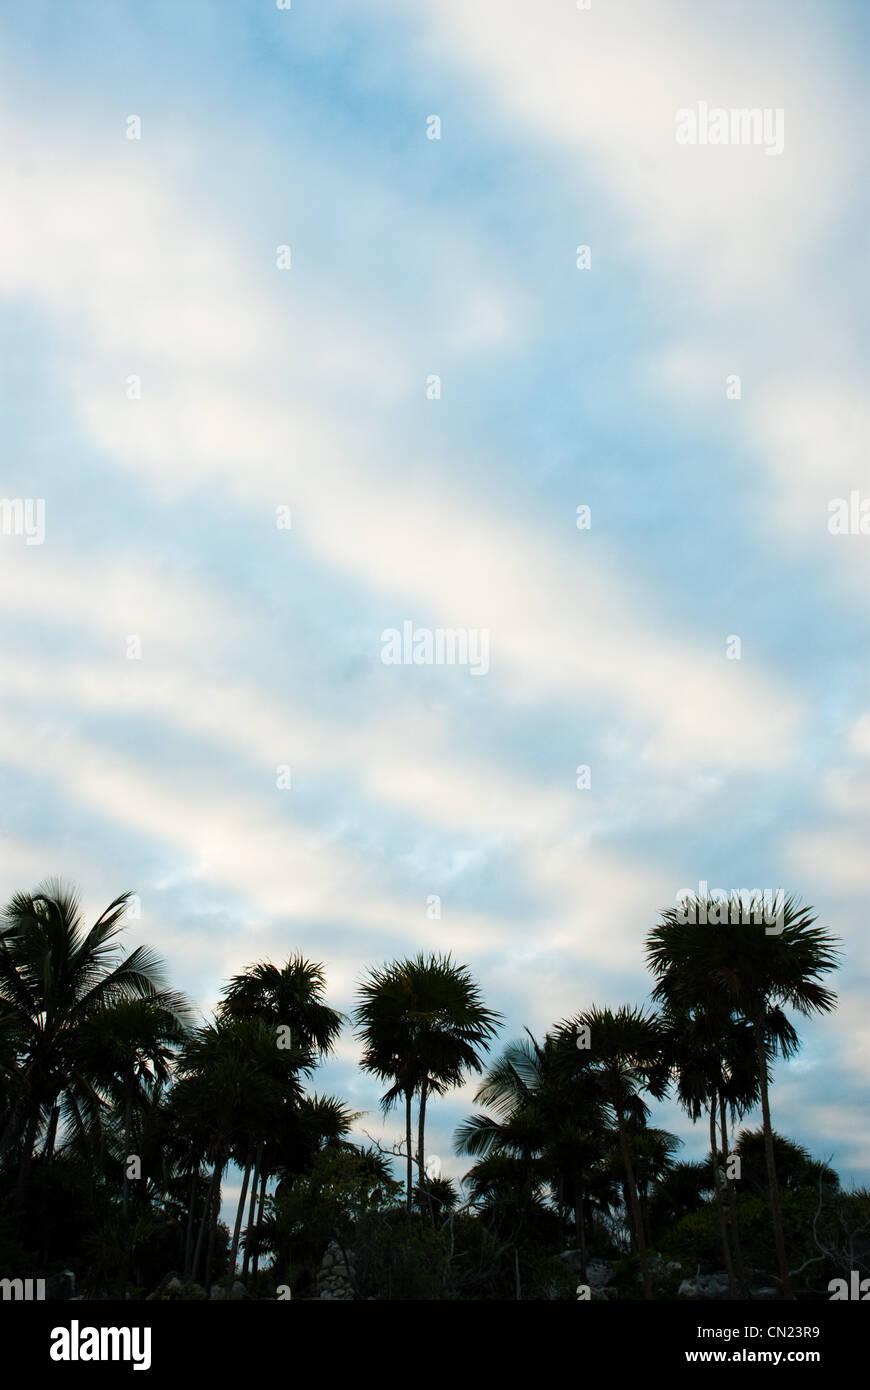 Palm trees, Tulum, Mexico - Stock Image